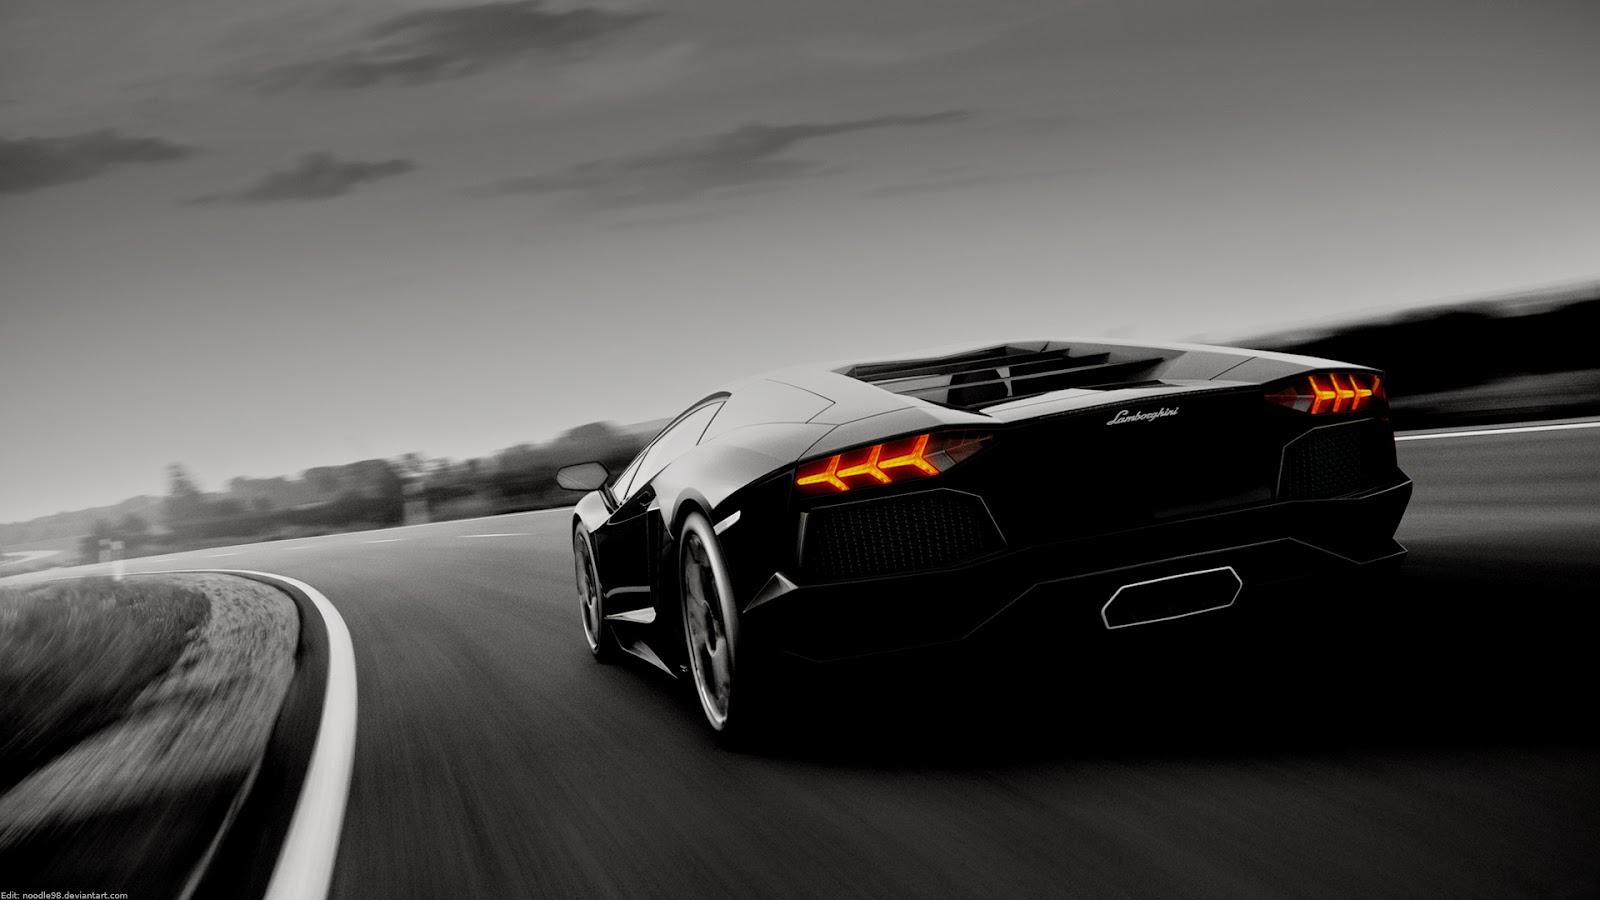 Veneno Hd Wallpaper ดาวน์โหลด Lamborghini Wallpaper Hd พื้นที่ Download